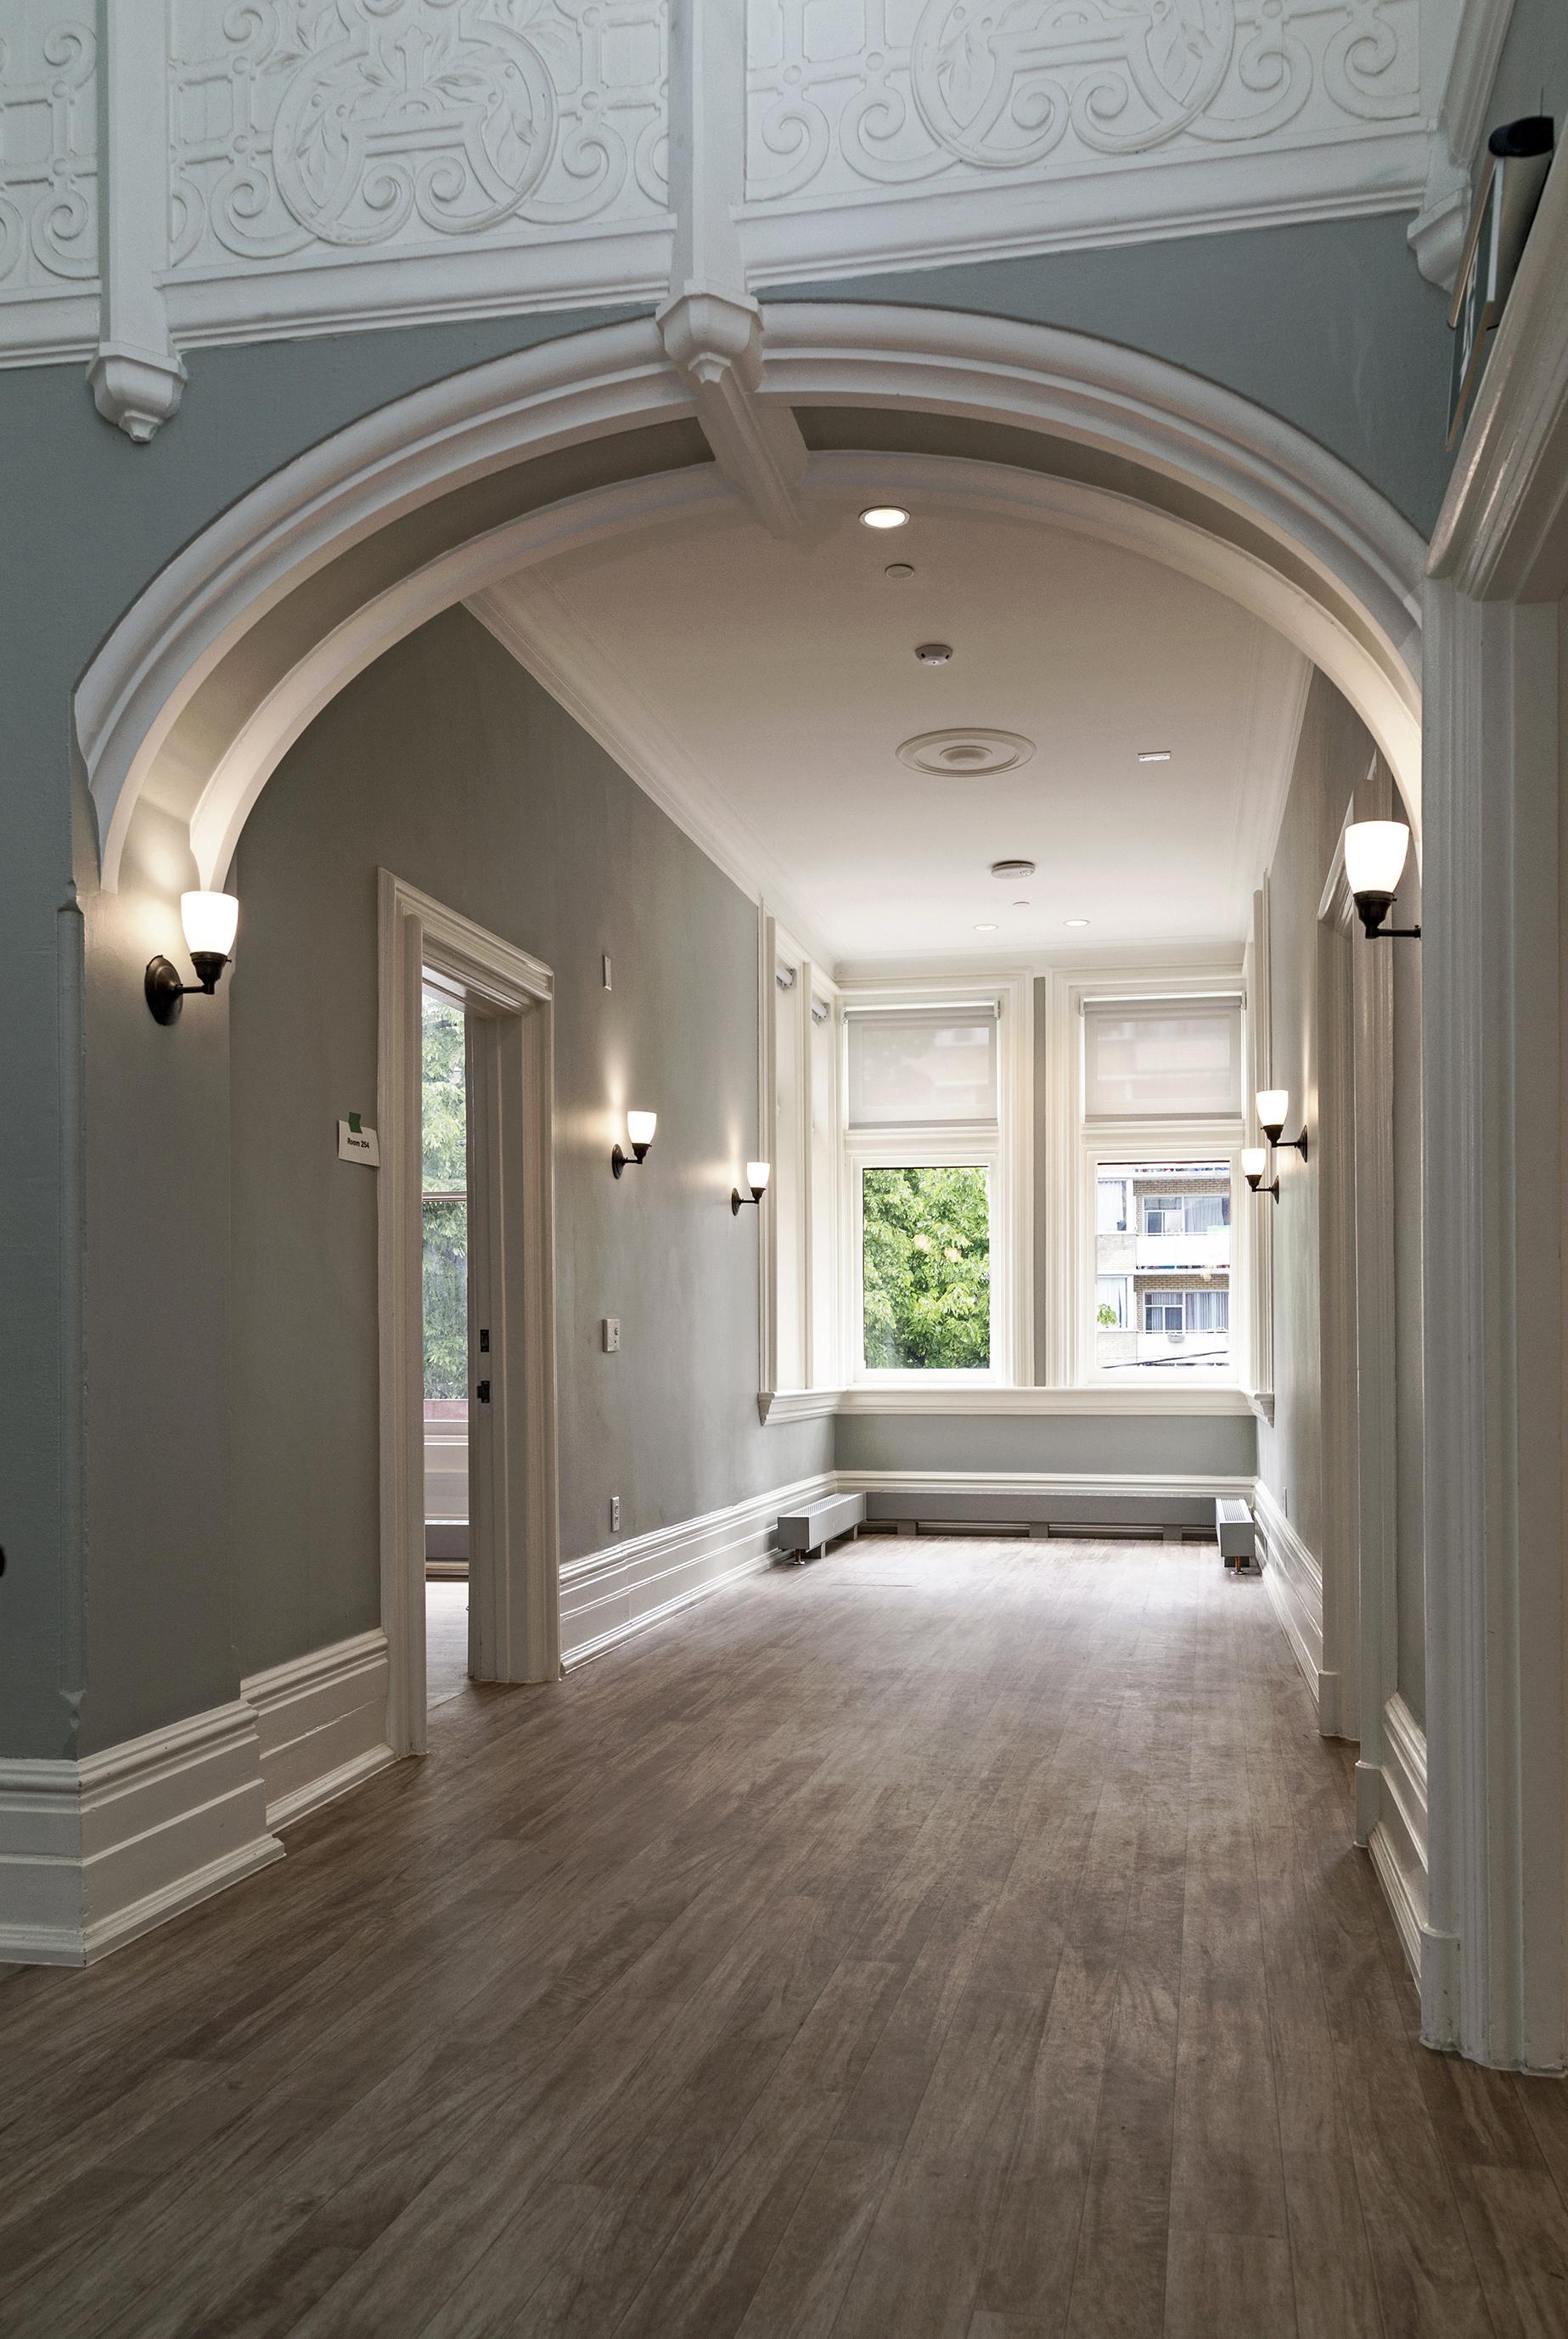 Ремонт и дизайн арки в коридоре